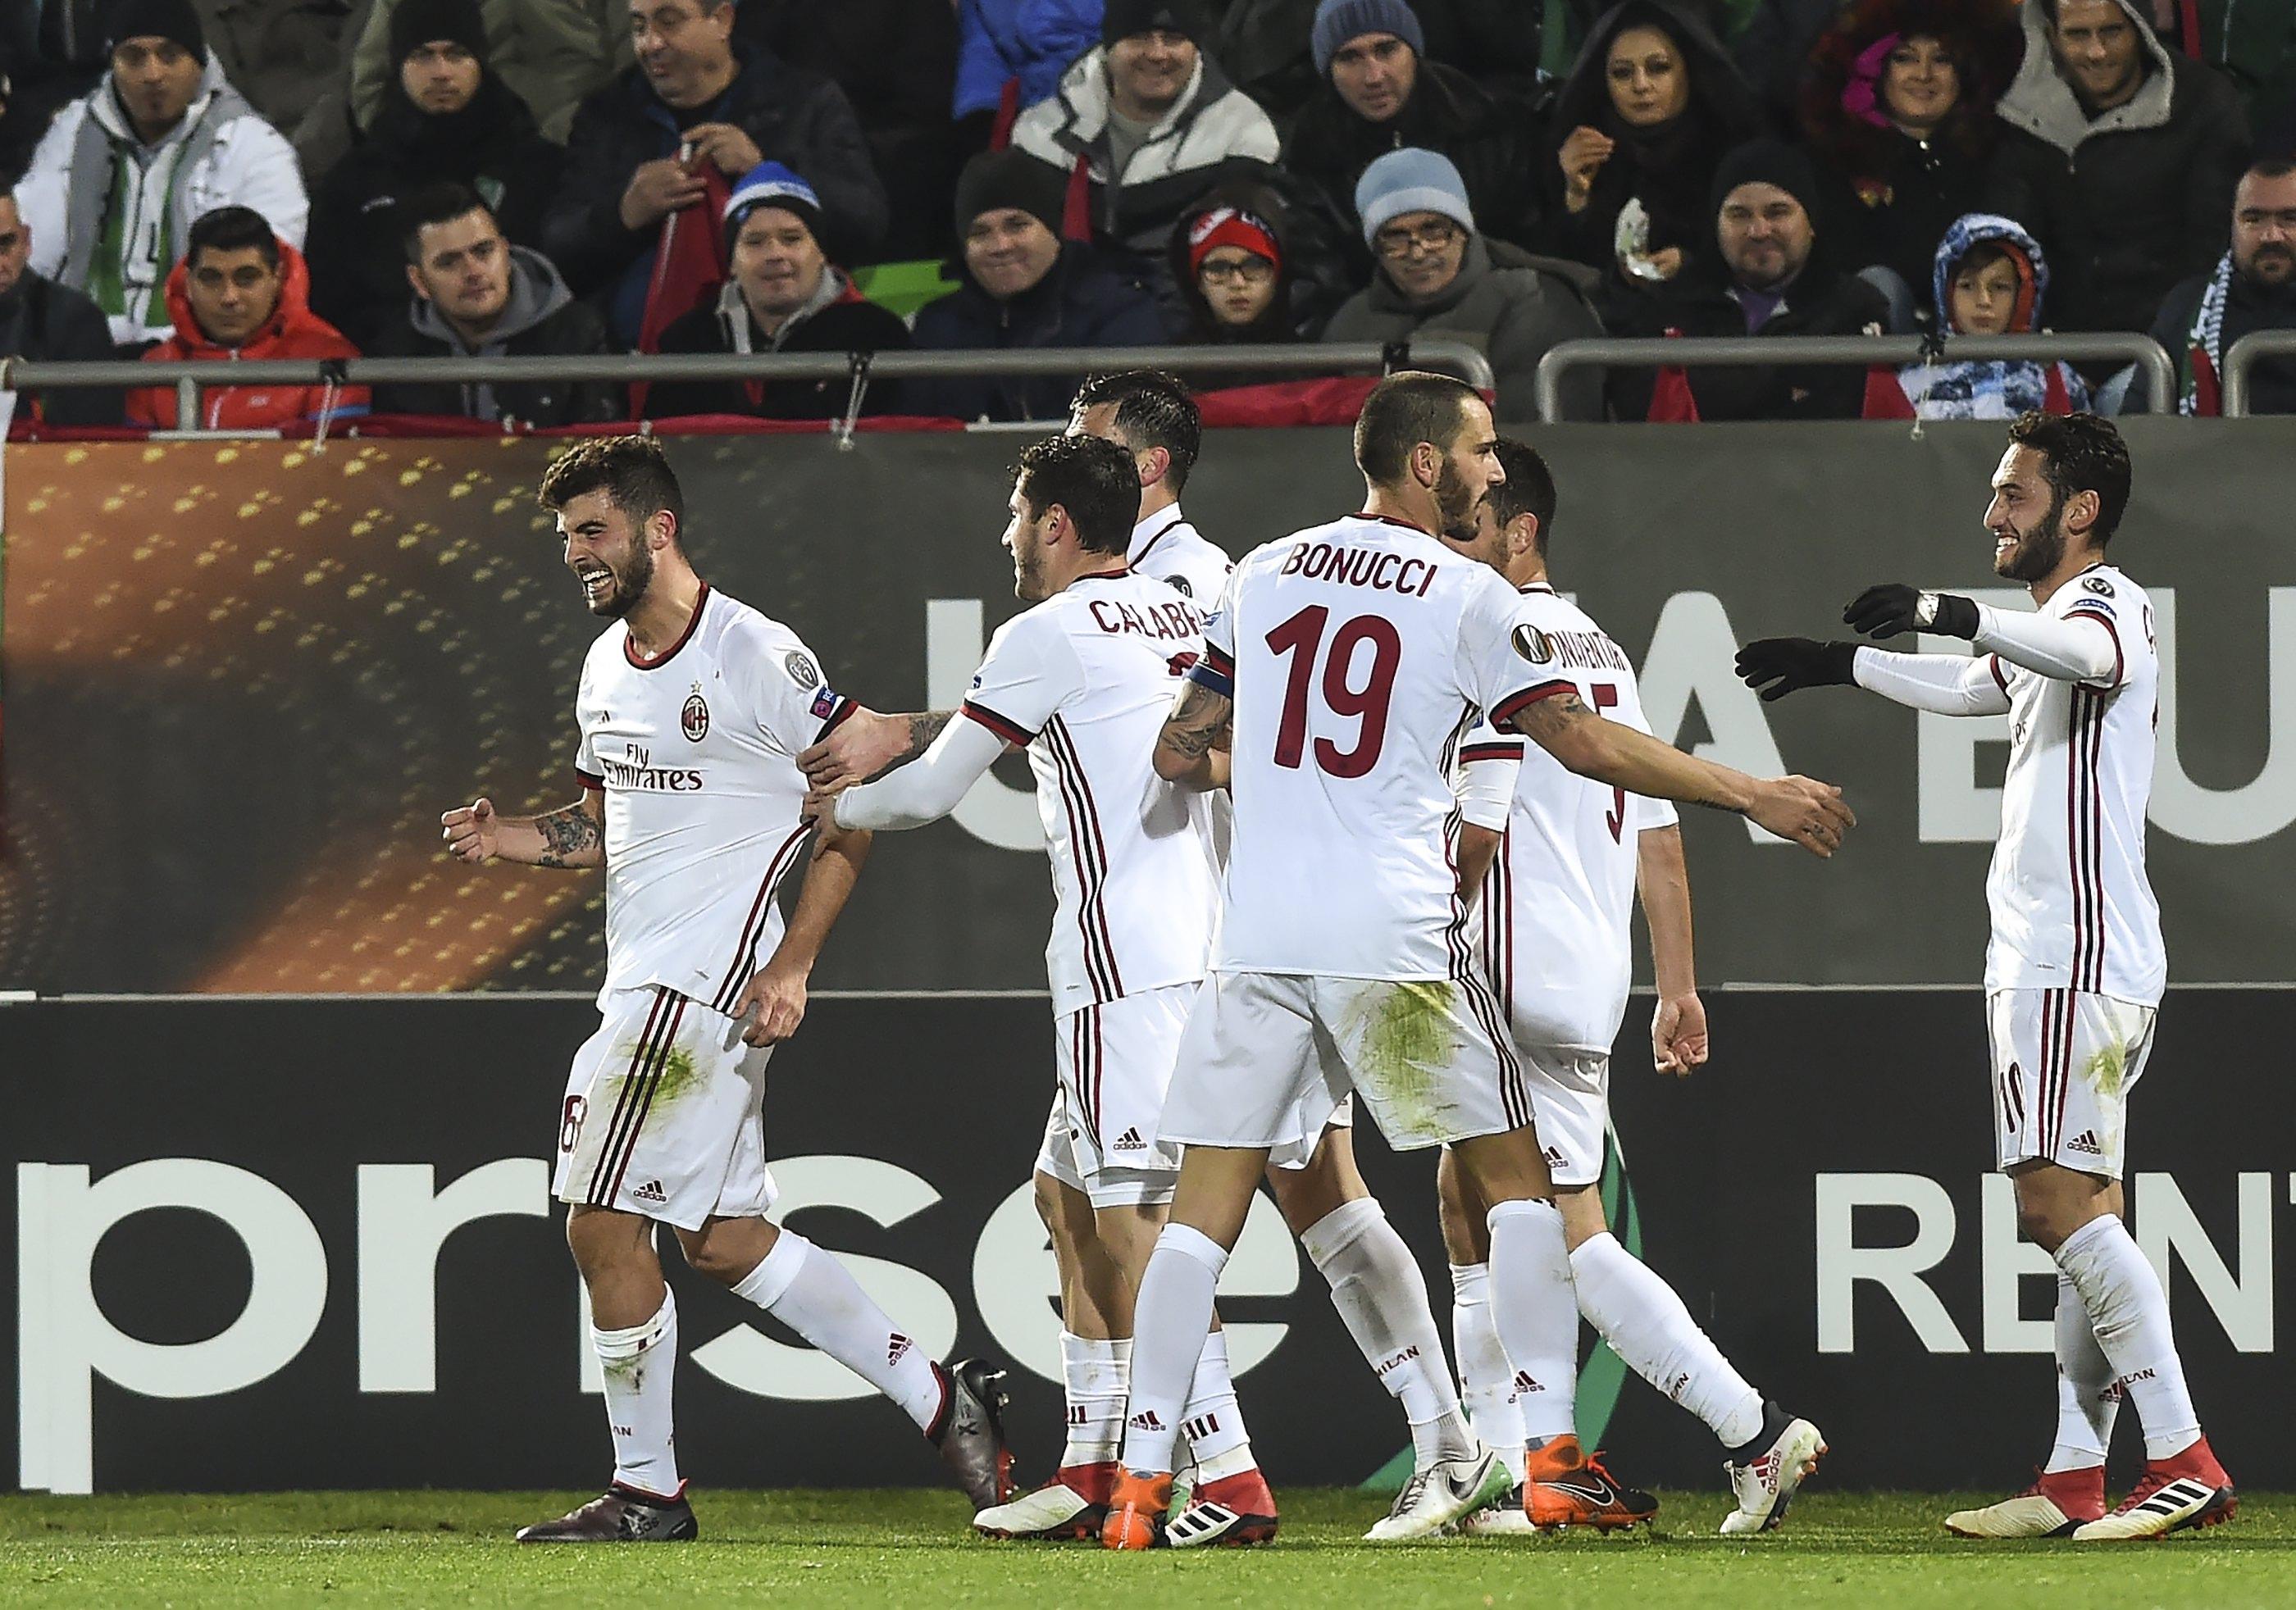 CAS PRIHVATIO ŽALBU Milan ipak u Europa ligi